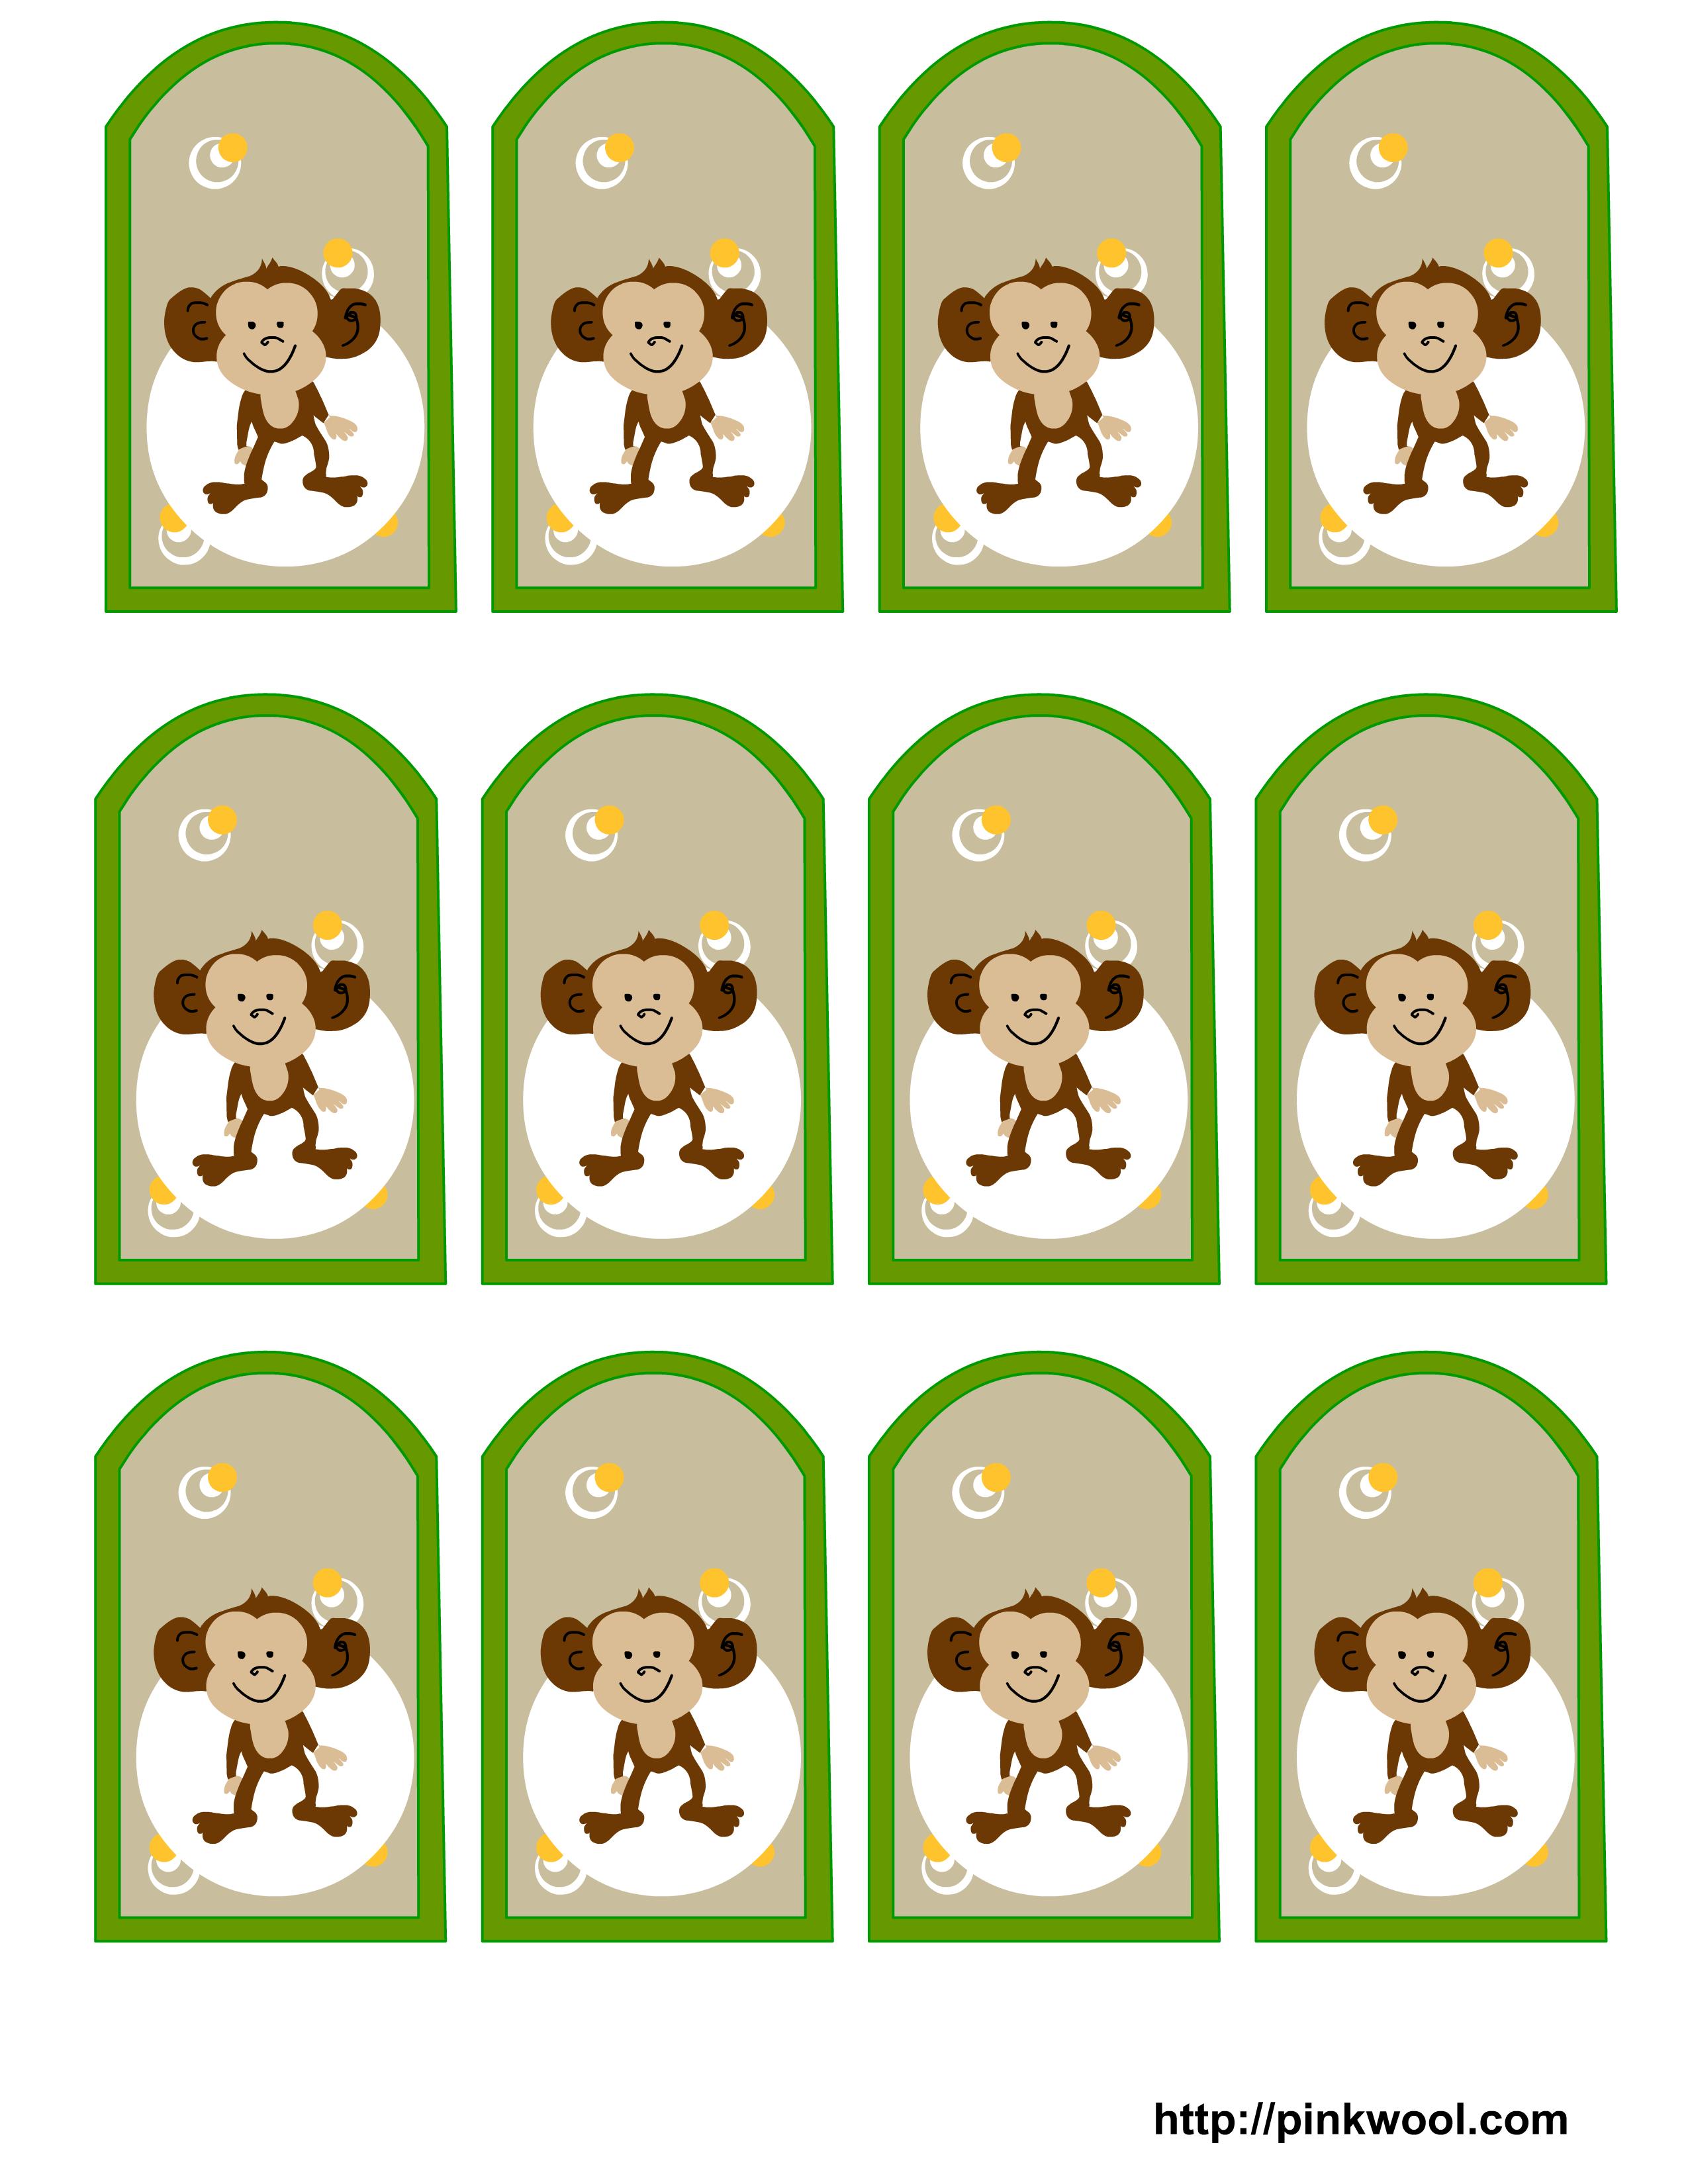 Image detail for Free Printable Jungle Safari themed baby